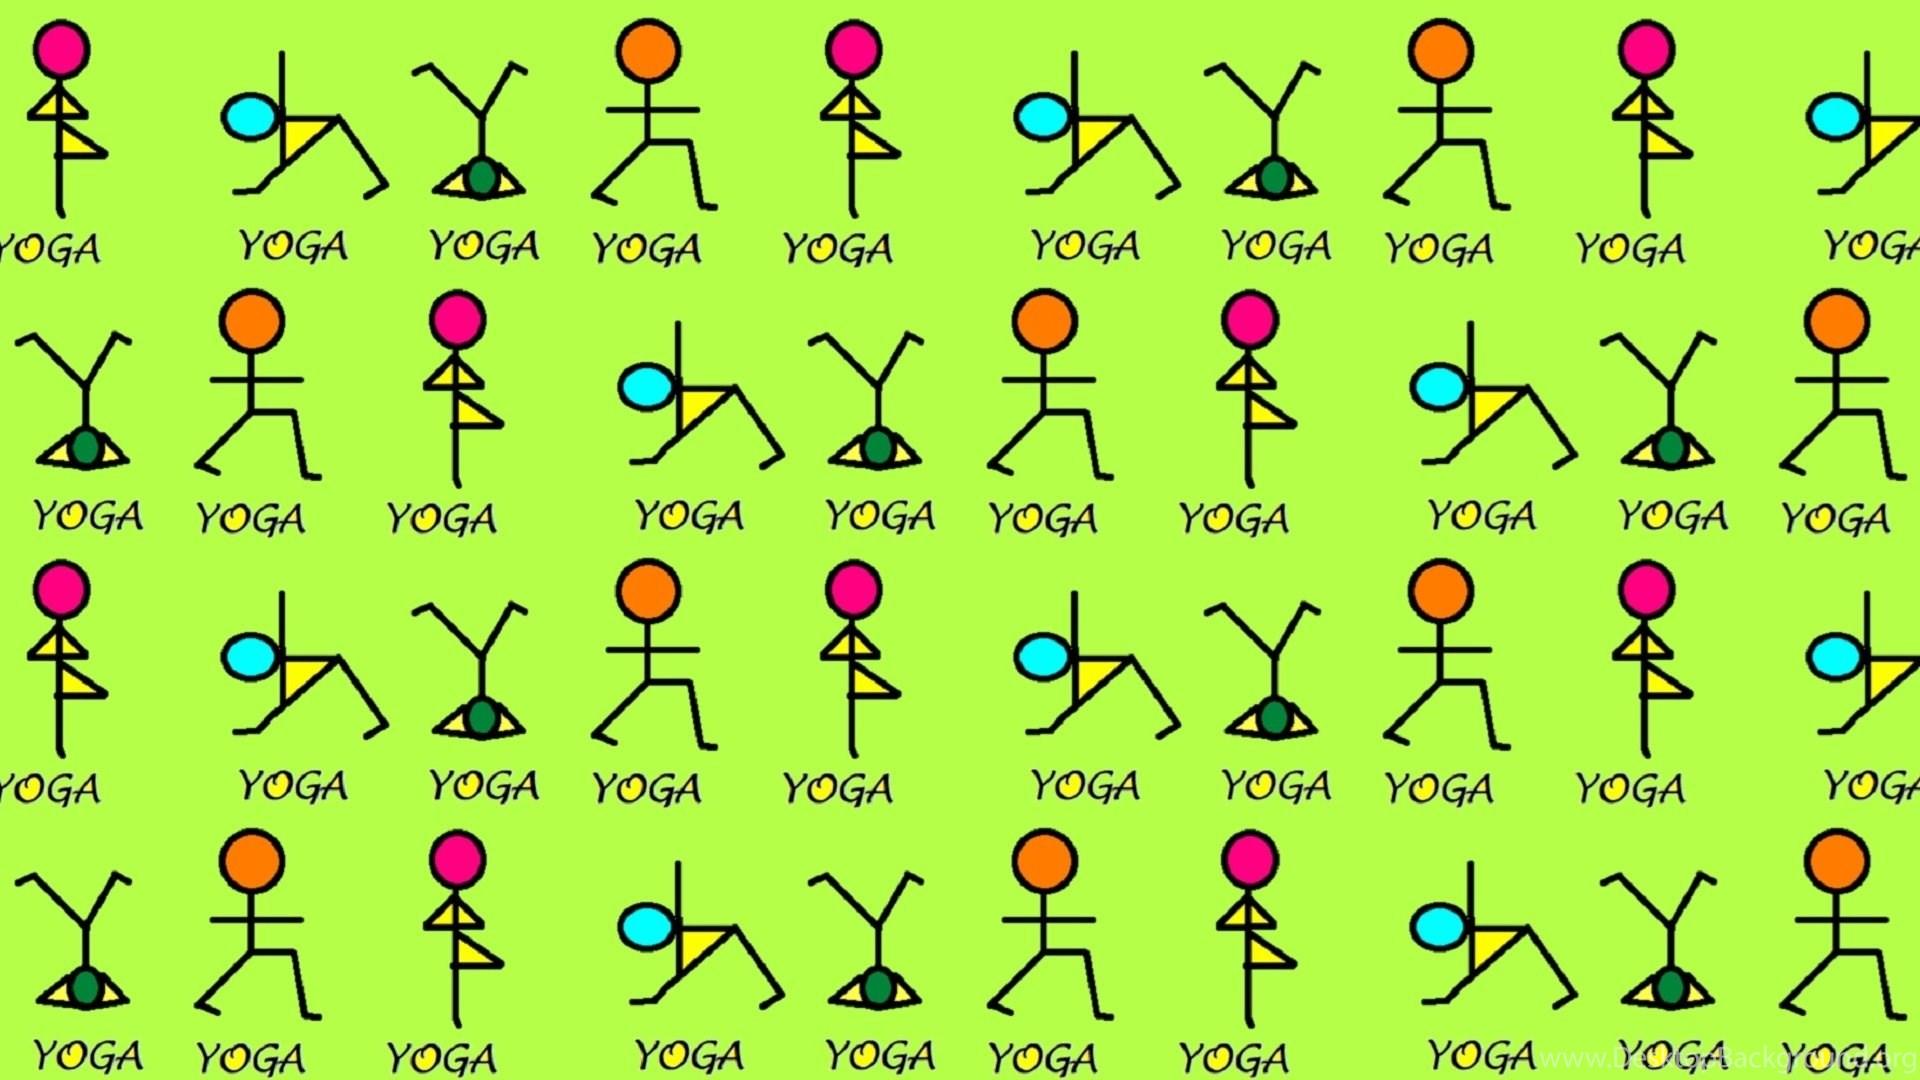 1920x1080 Irish Yoga Poses Yoga Poses Yoga Sports Stretching Desktop Background